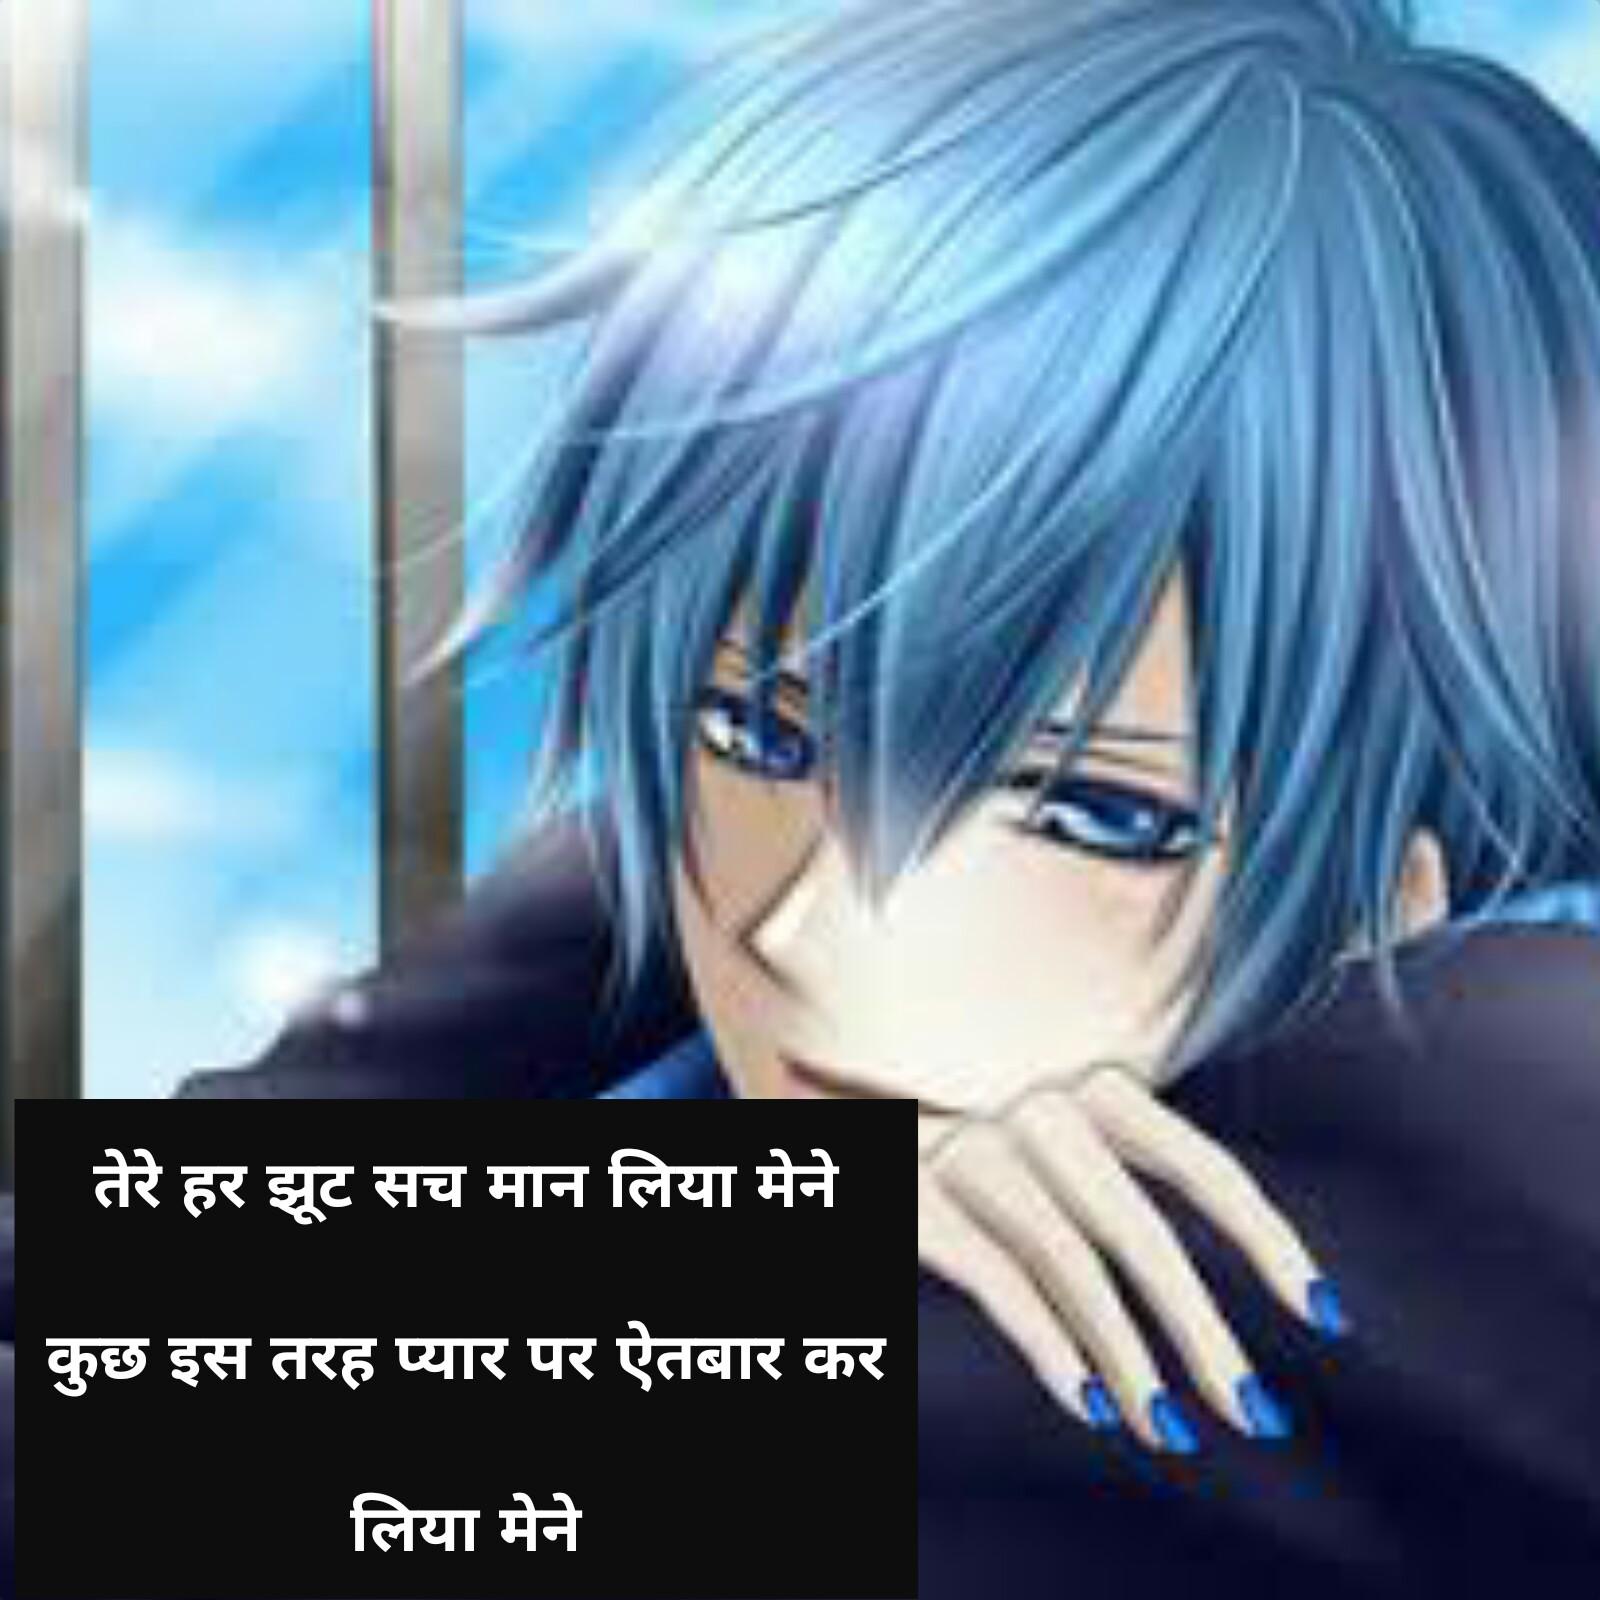 Sad shayari in two line hindi with image sad image shagari thecheapjerseys Gallery